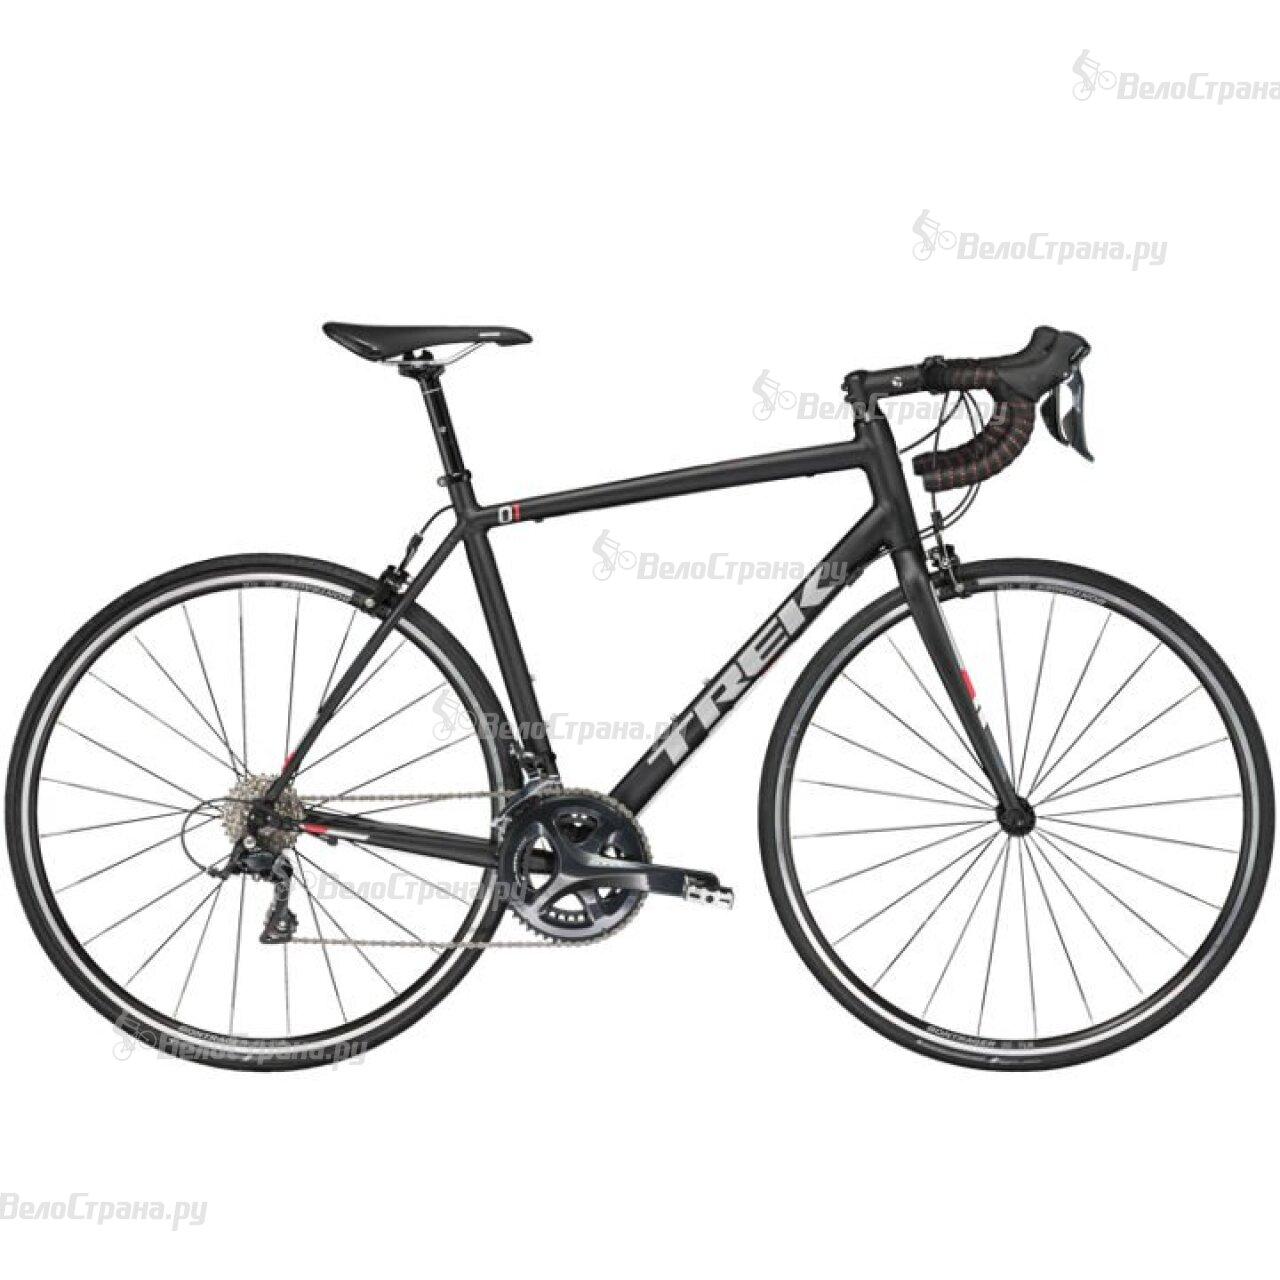 Велосипед Trek 1.2 C H2 (2017) велосипед trek 1 2 c h2 2013